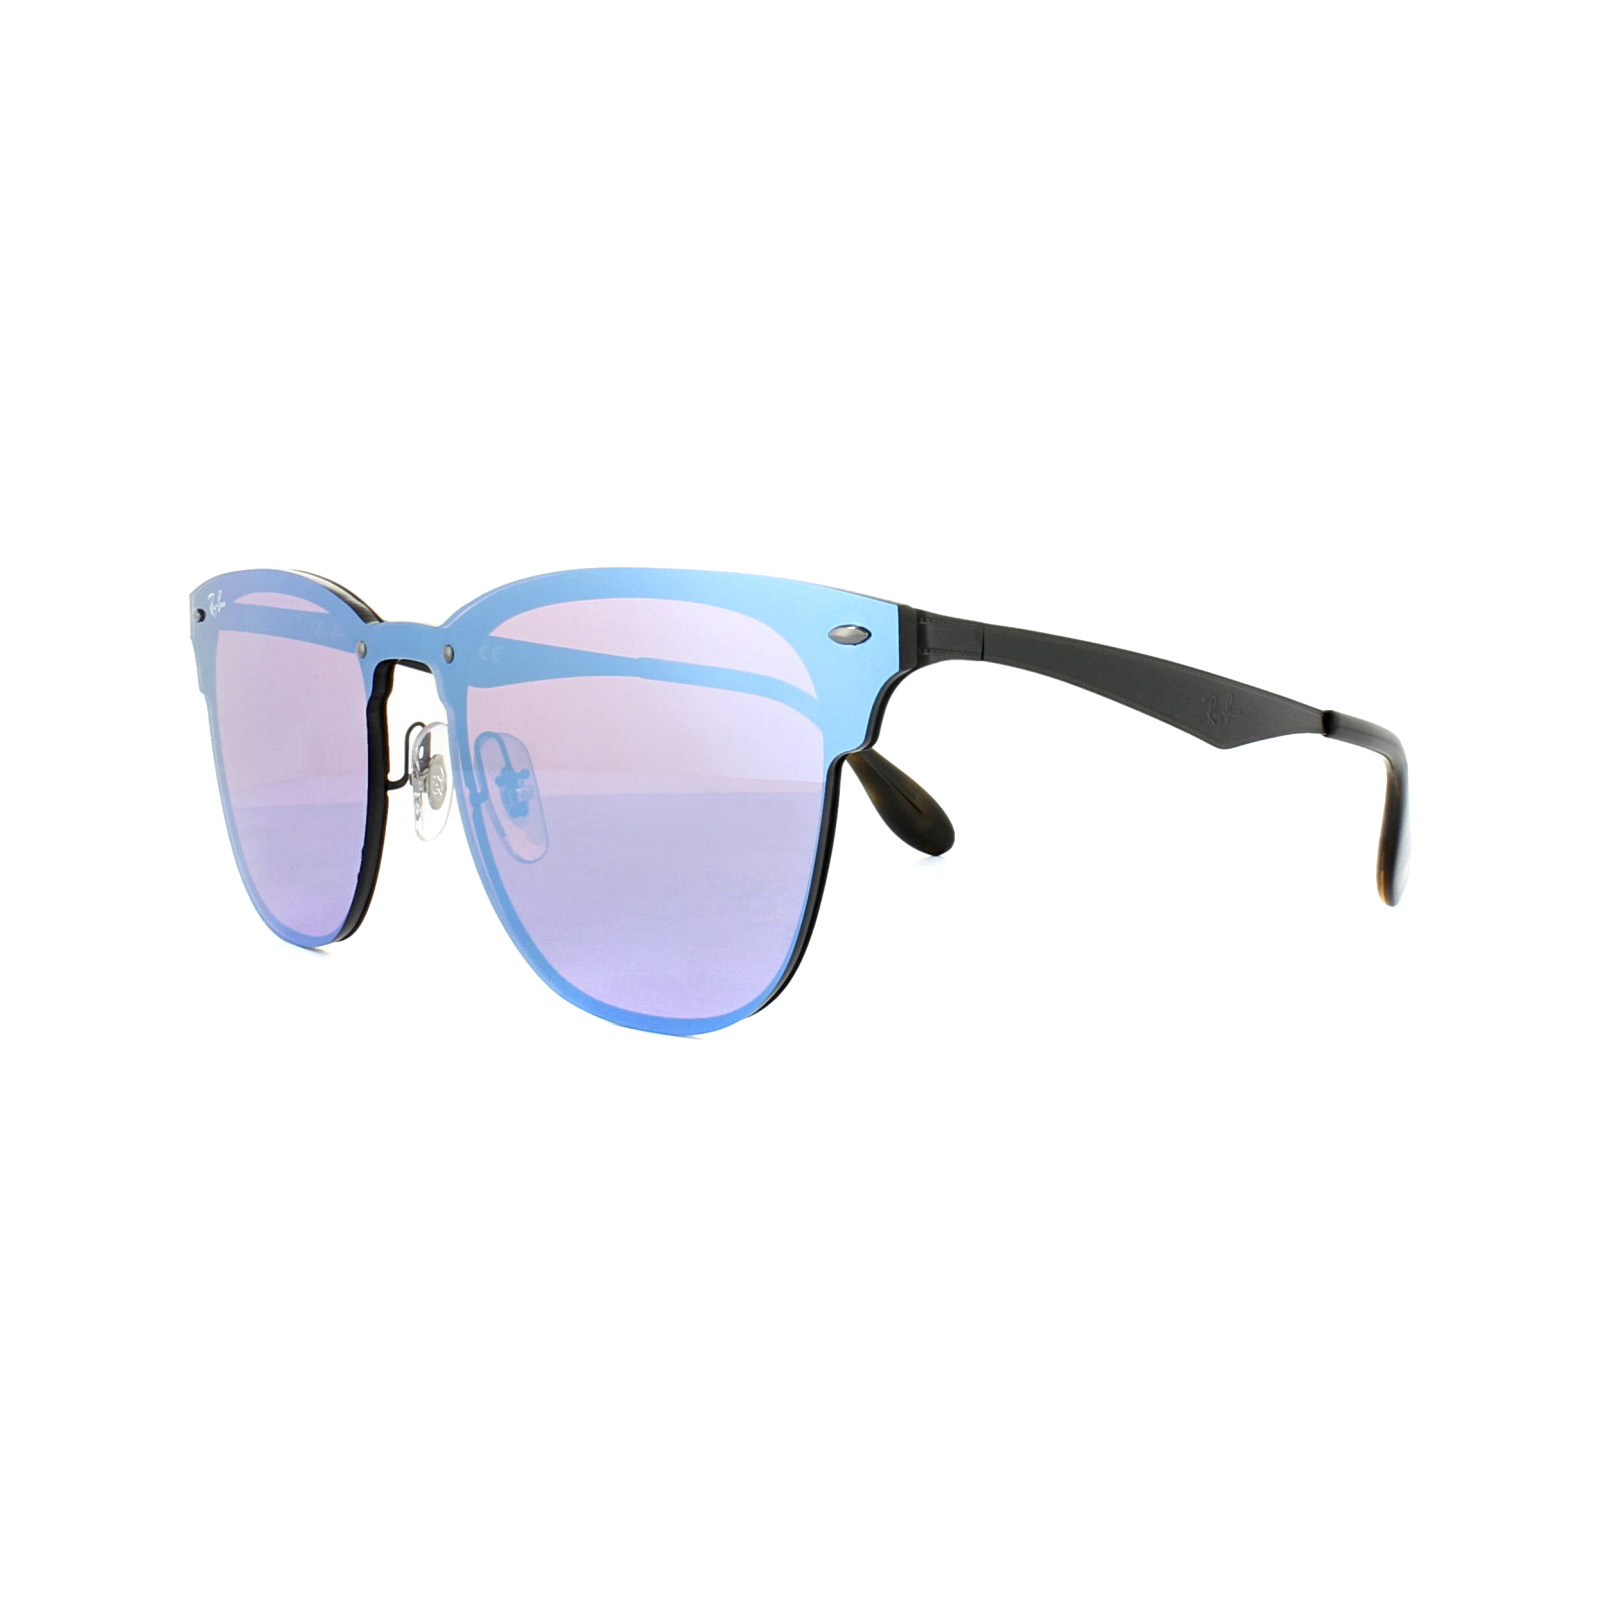 d5afaaddd5 Sentinel Ray-Ban Sunglasses Blaze Clubmaster 3576N 153 7V Black Dark Violet  Blue Mirror